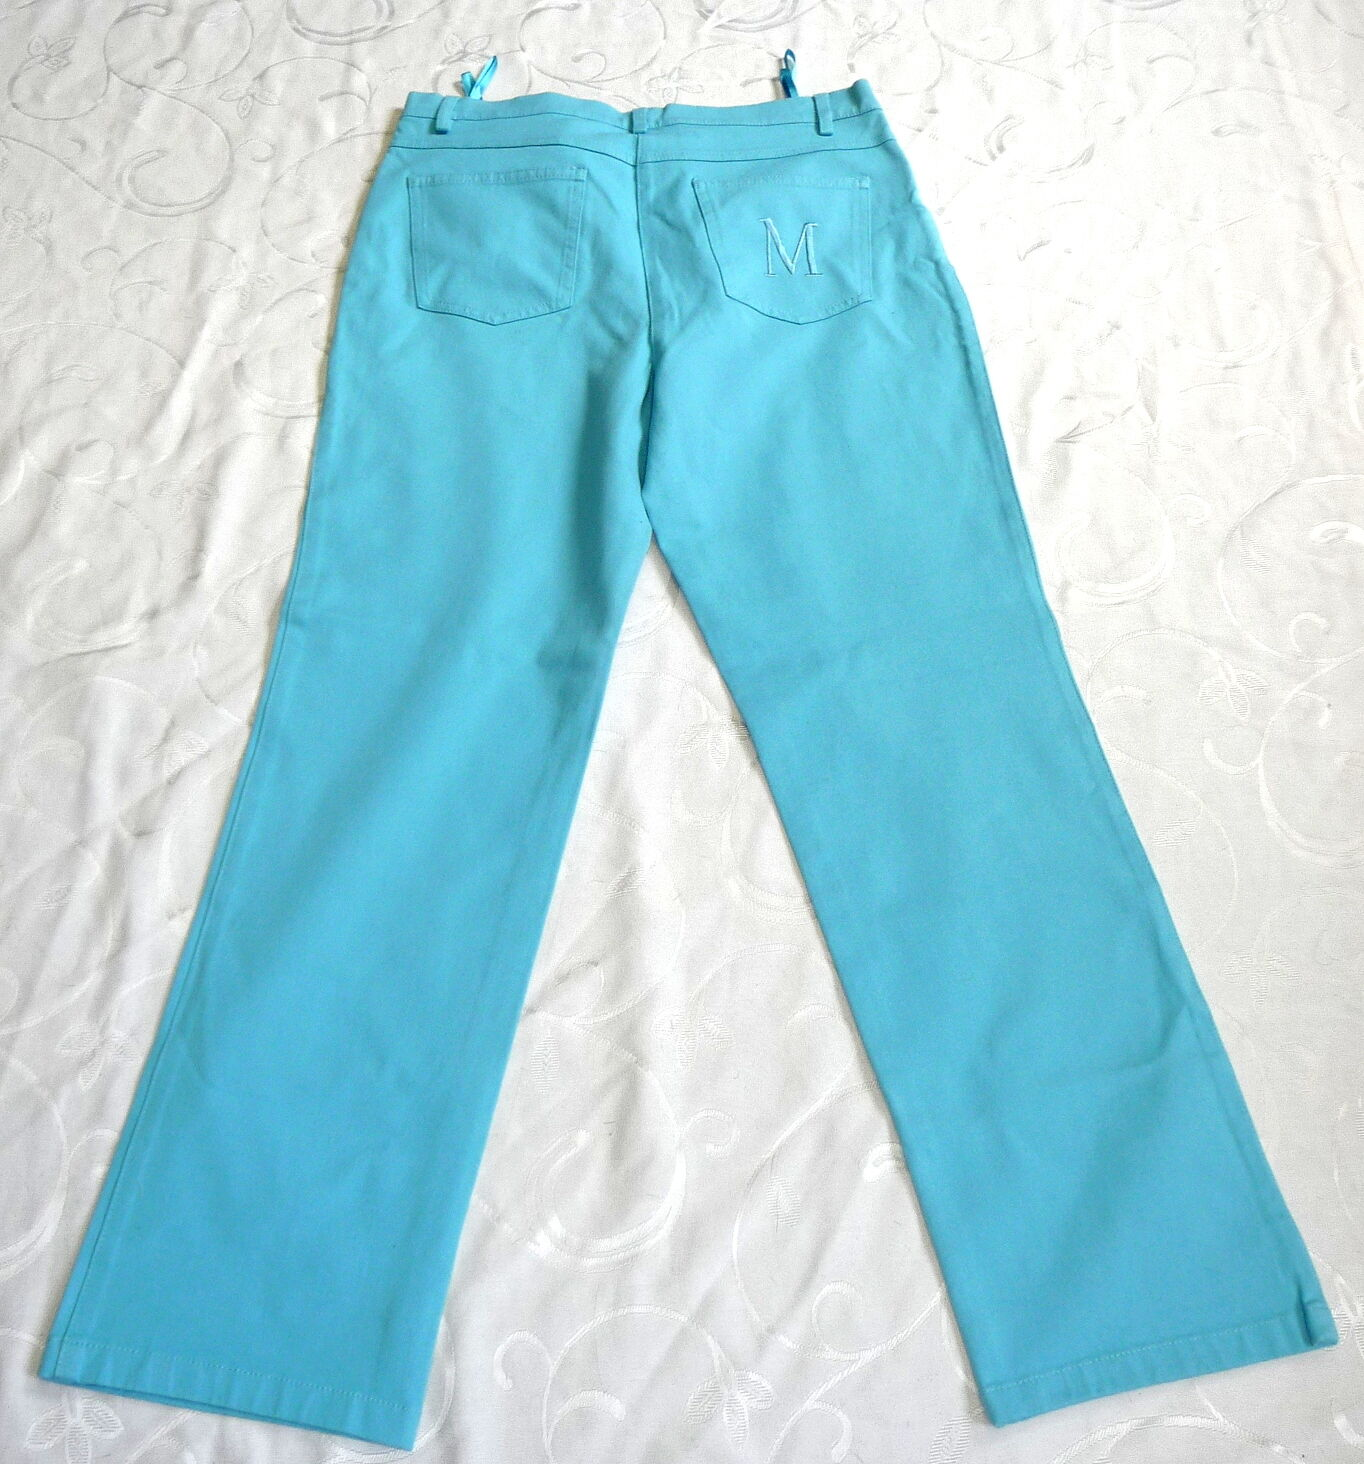 NUOVO Madeleine 20 corto 40 Jeans Turchese Pantaloni Jeans Pantaloni Cotone Denim Stretch New